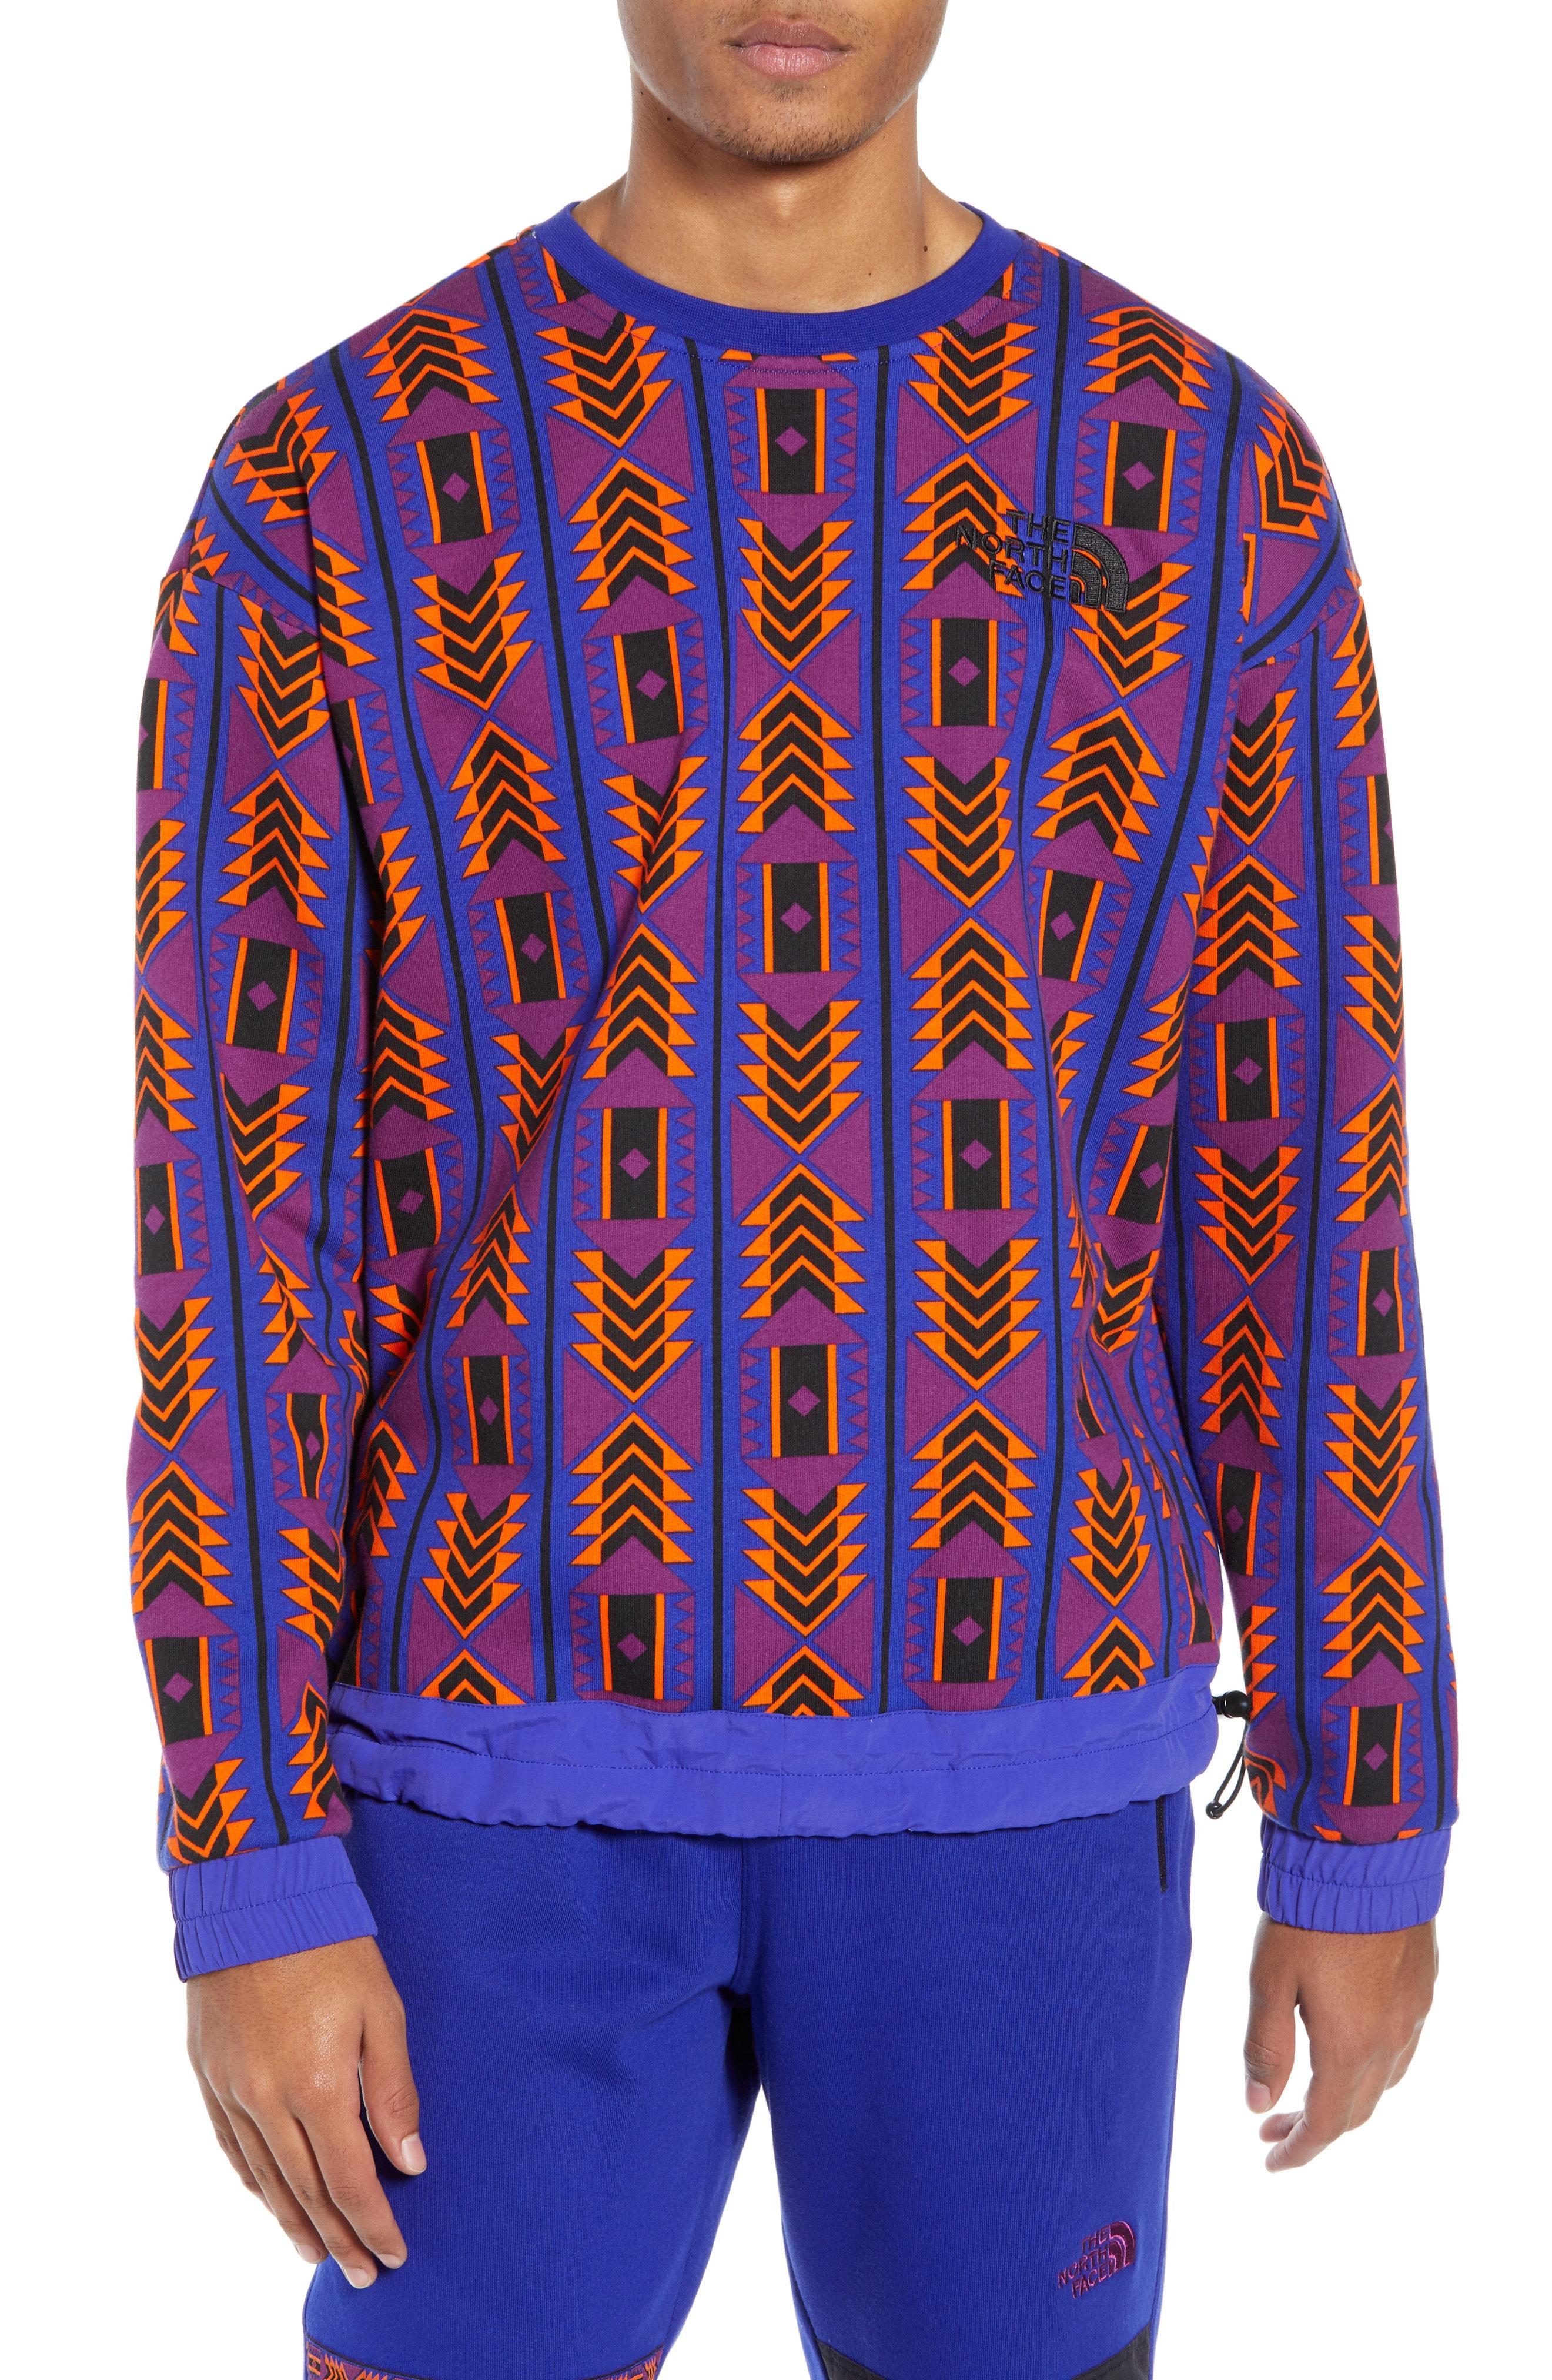 The North Face. Men s Blue  92 Rage Collection Fleece Crewneck Sweatshirt 1baab9592e